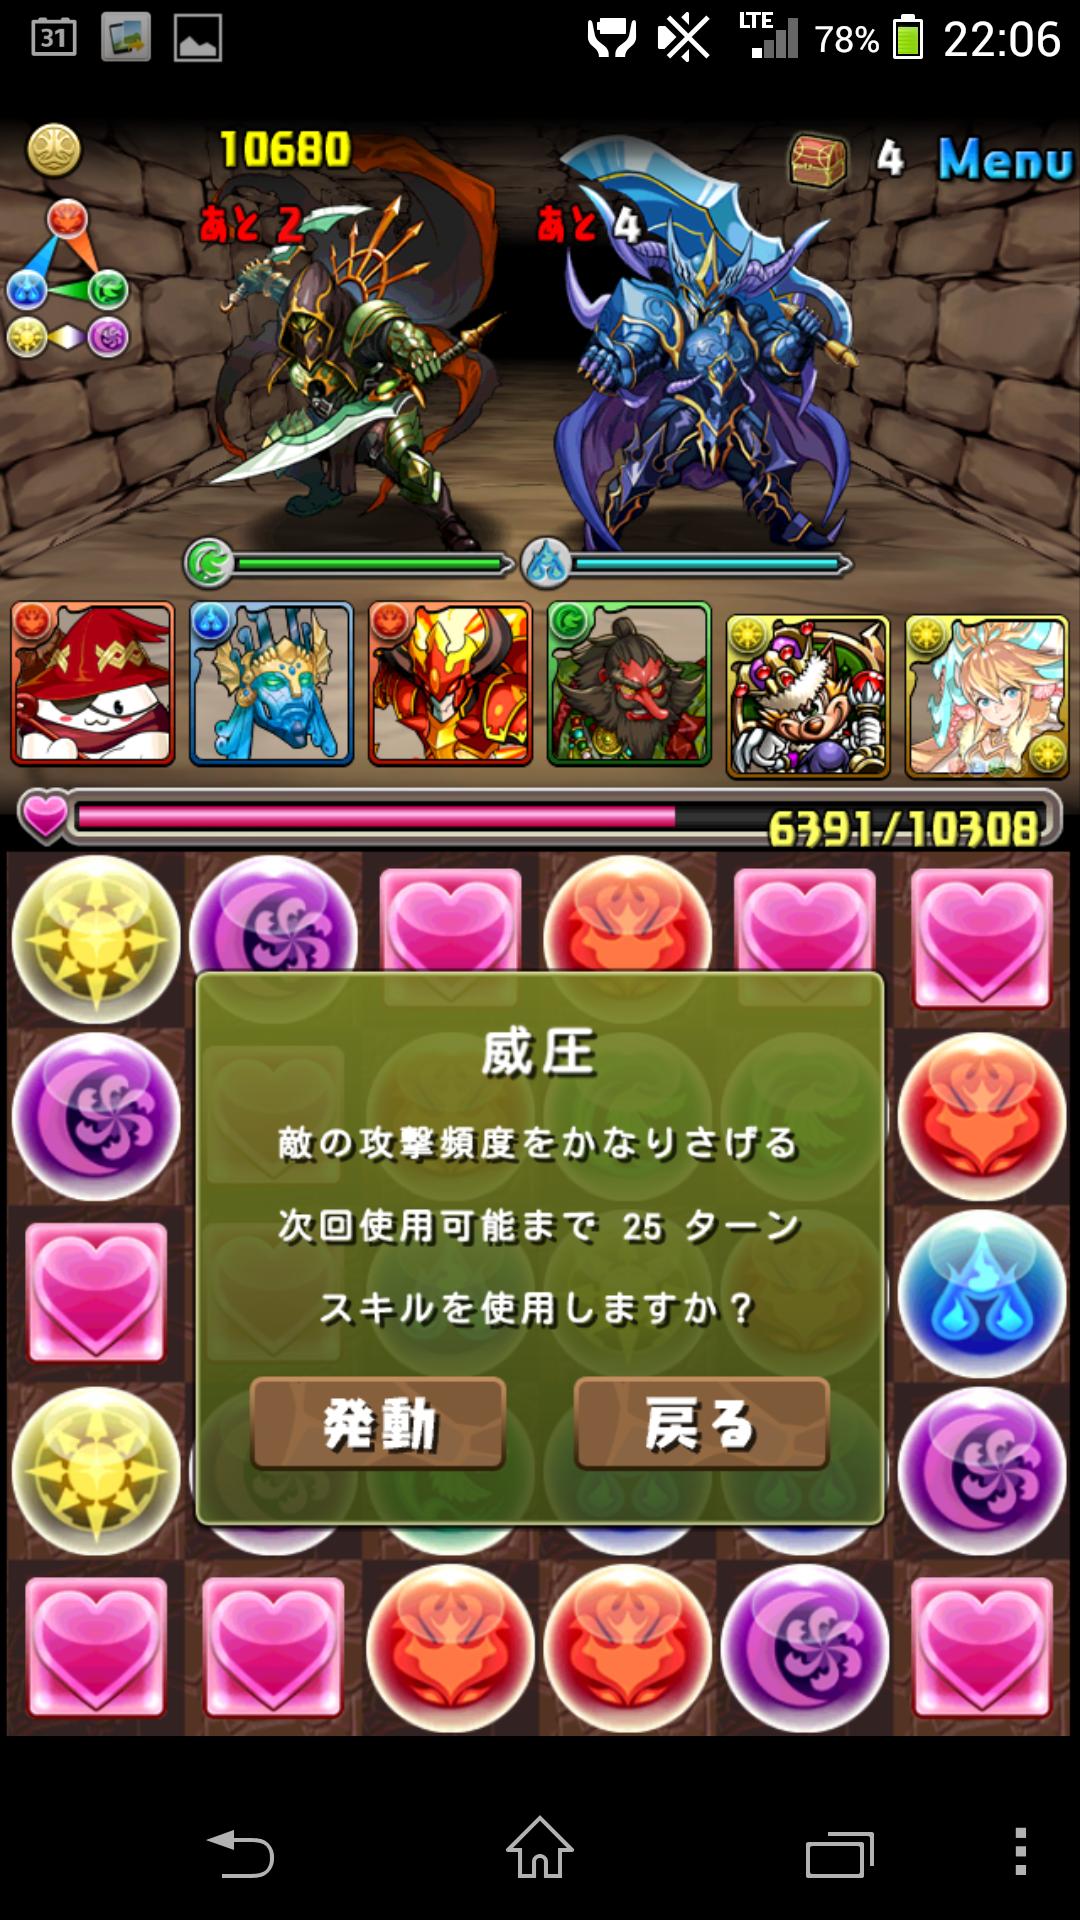 Screenshot_2014-05-12-22-06-38.png